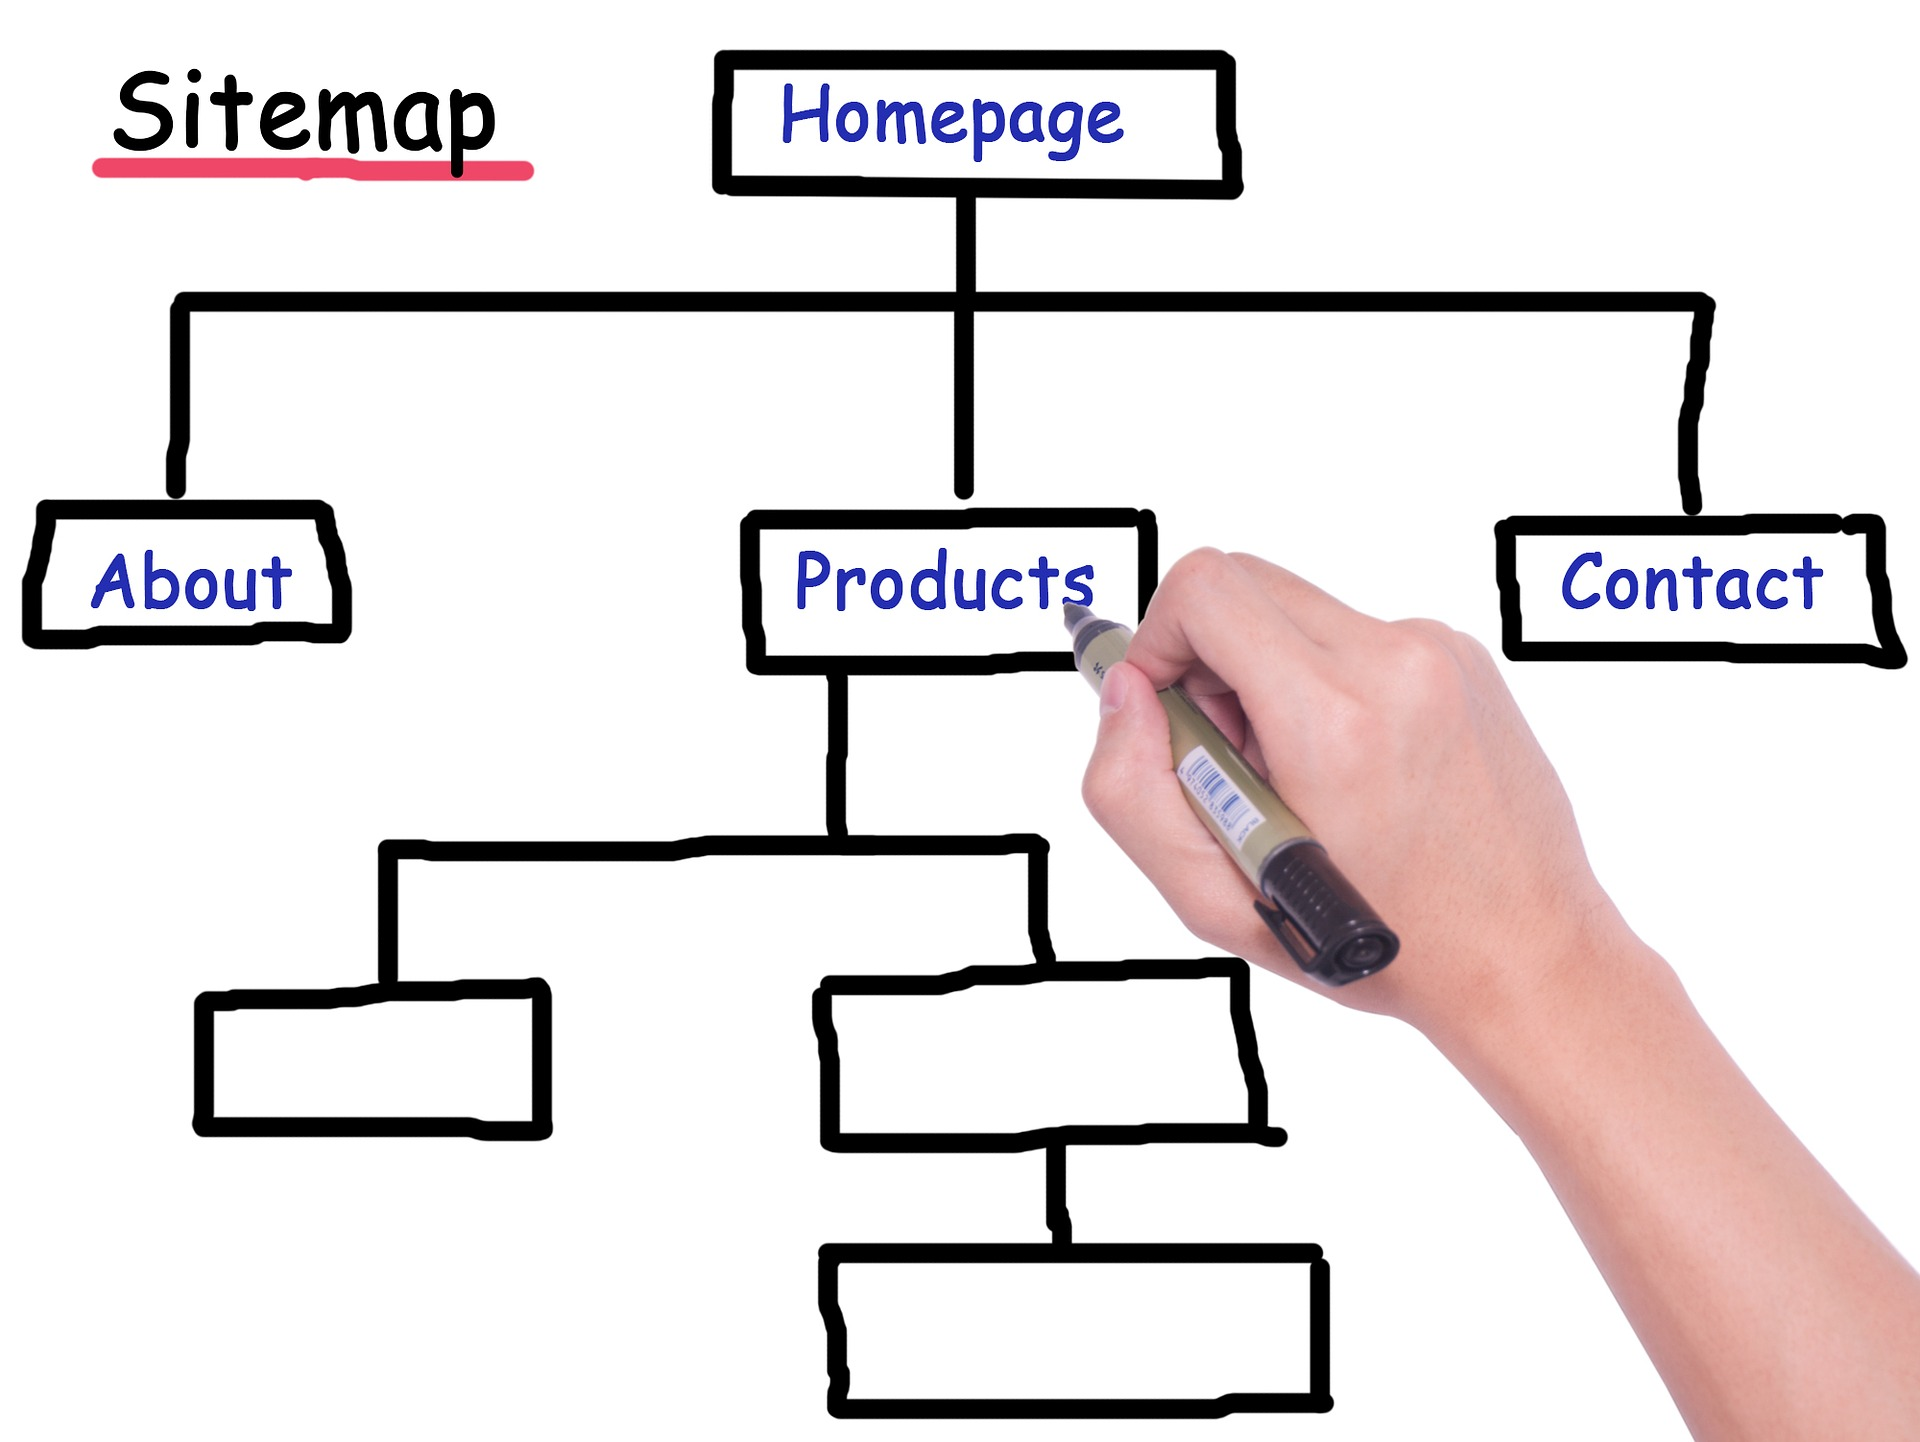 sitemap 2488231 1920 - WordPressのサイトマップの作成方法!おすすめプラグイン4つも紹介